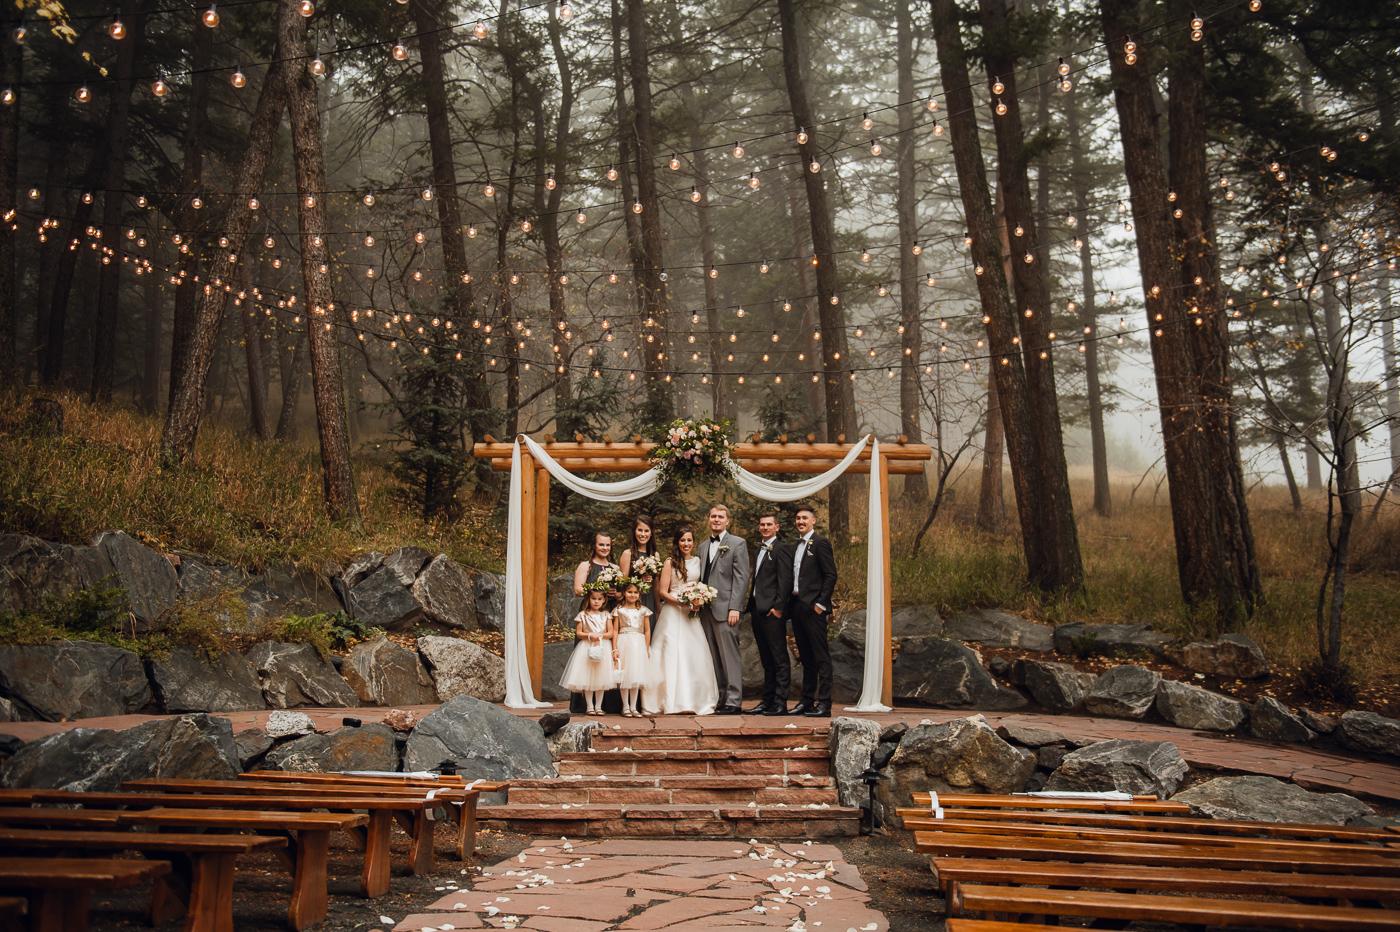 Candice Rawlin Wedding PHOCO Photography Pines Genesee Golden Colorado Fog -21.jpg